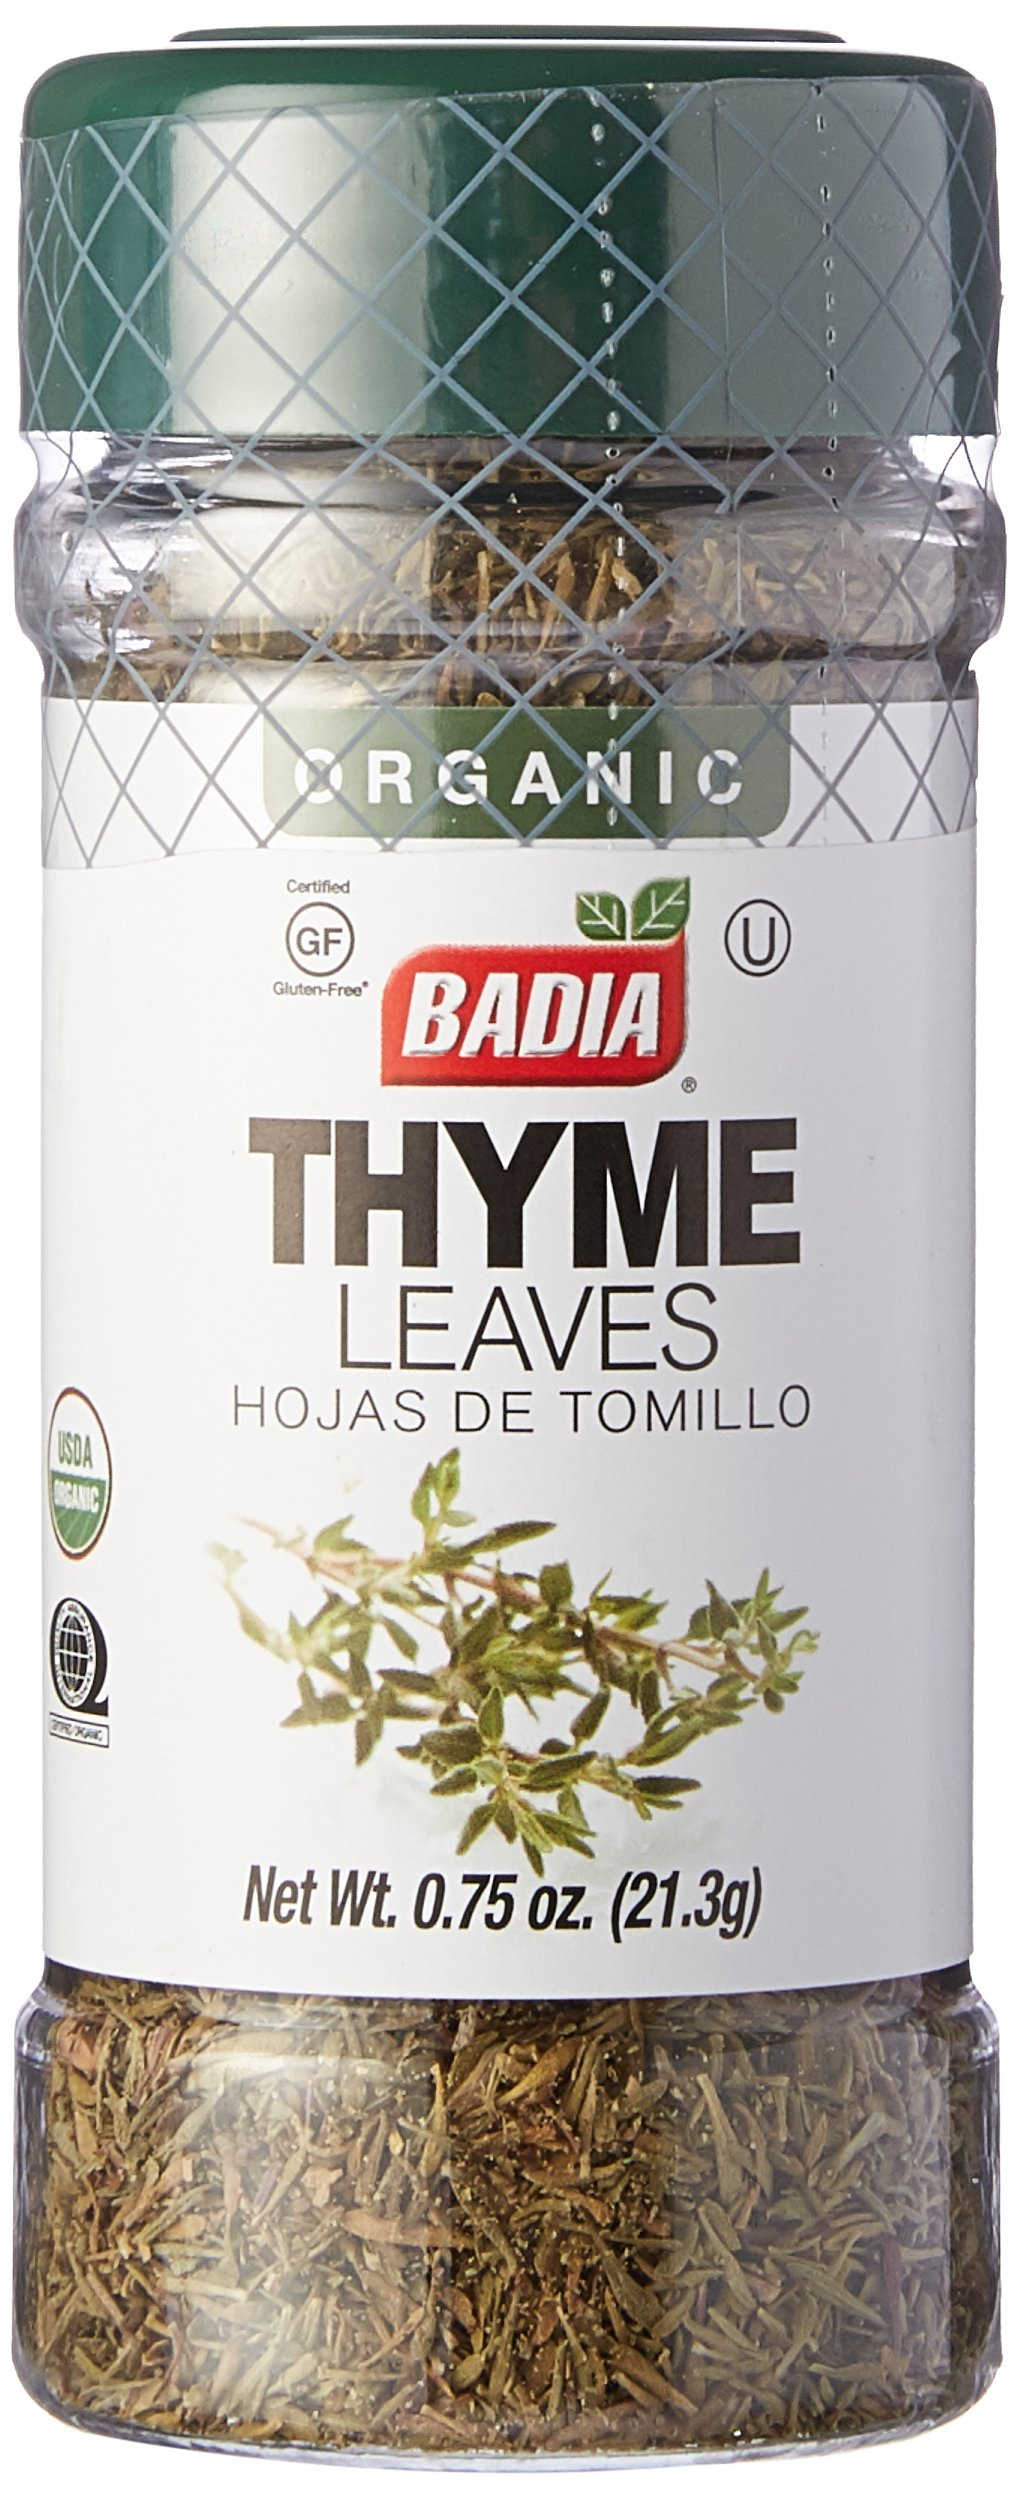 Badia Thyme Leaves Organic 0.75 oz